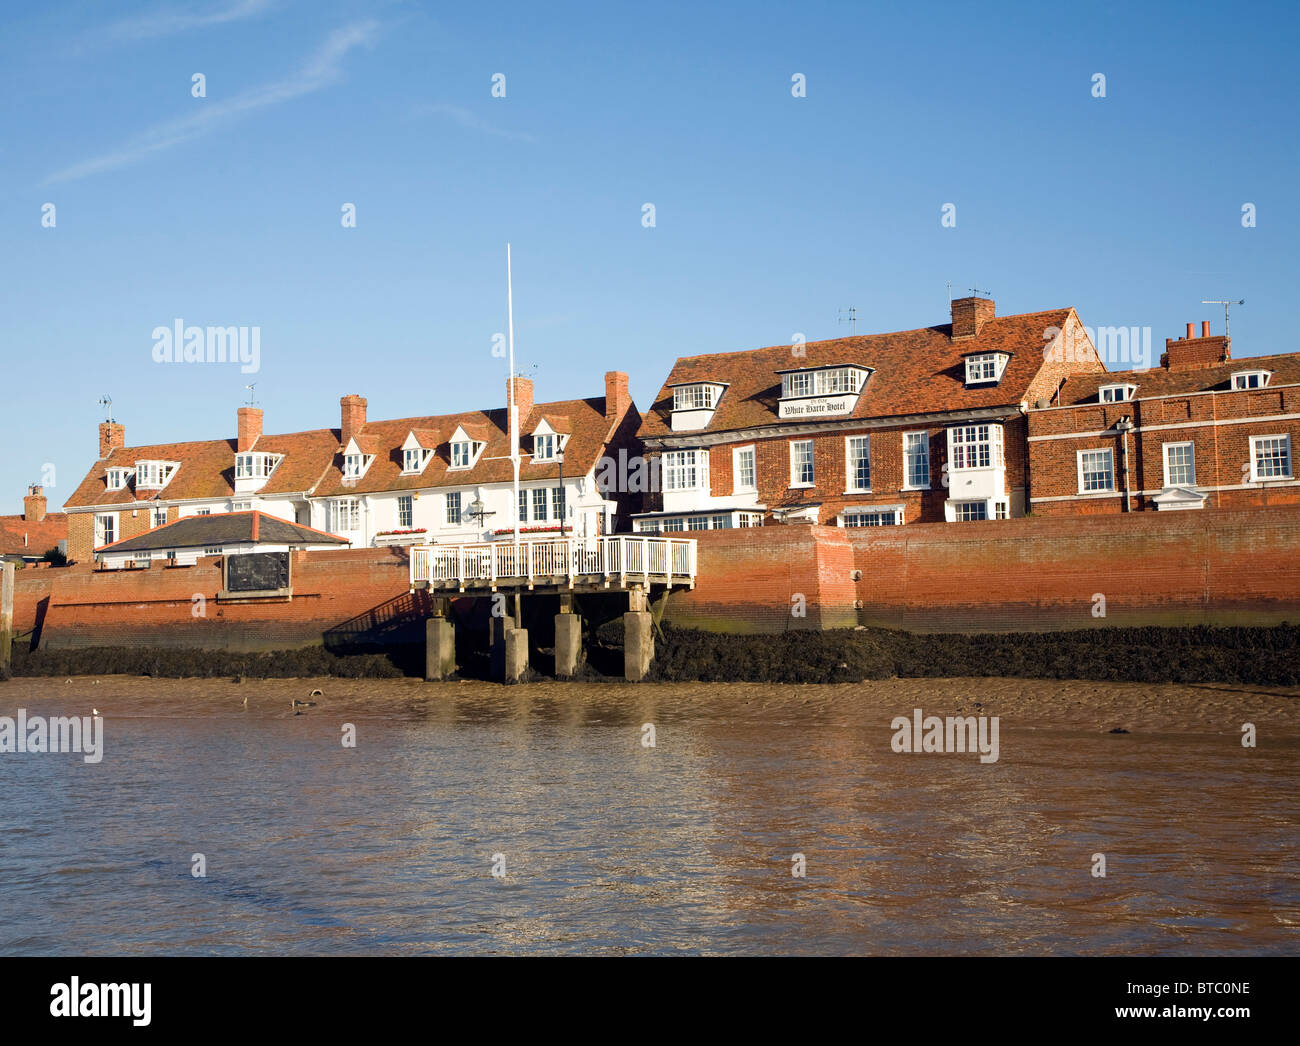 Muelle histórico edificios Crouch, Burnham en Essex, Inglaterra Imagen De Stock